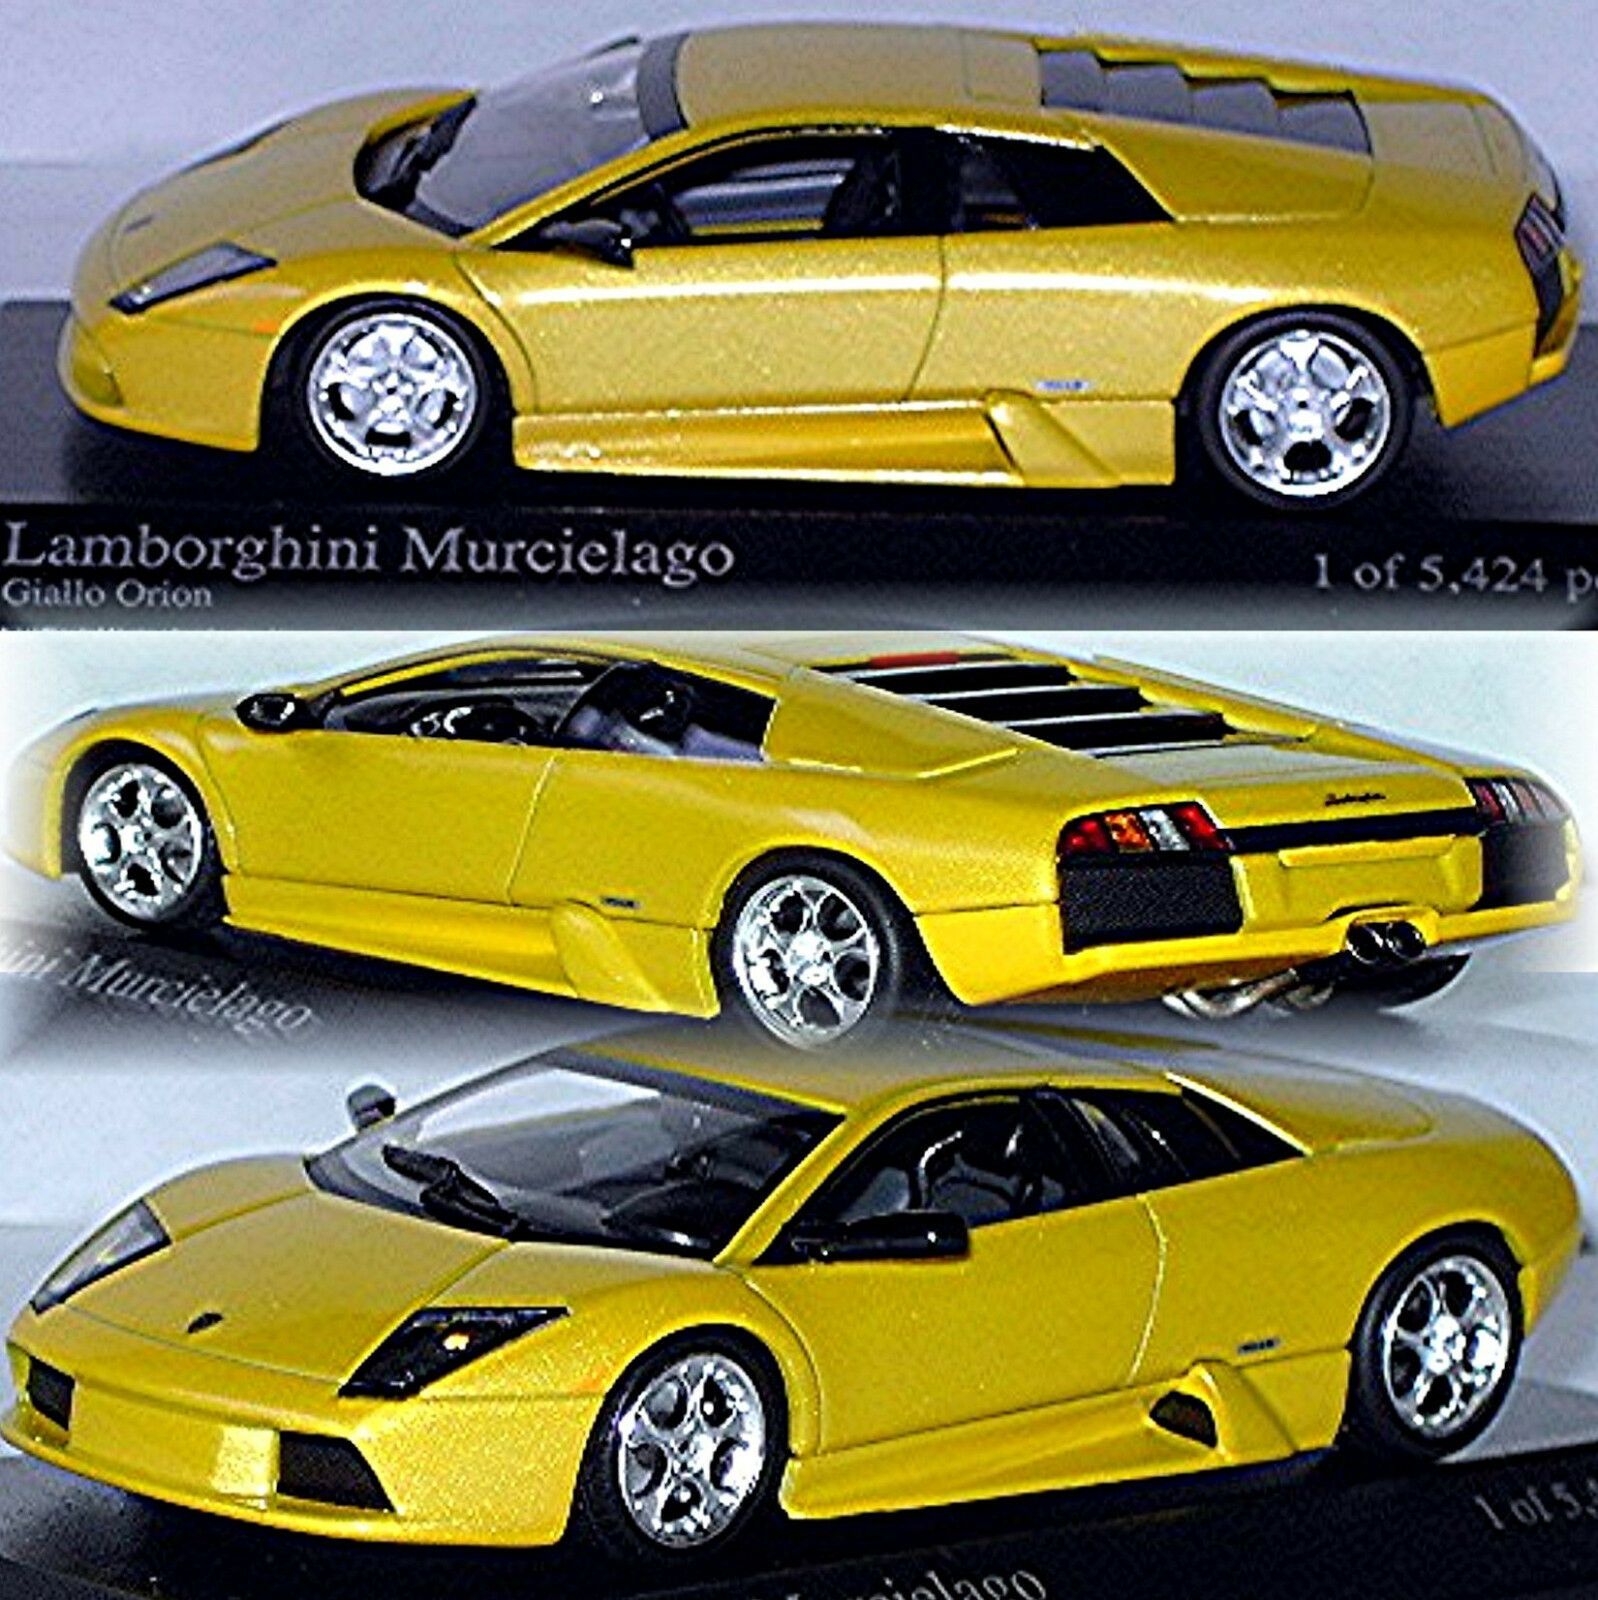 Lamborghini Murcielago Coupe 2004 yellow Orion Orion Orion Yellow Metallic 1 43 Minichamps 3a52e5